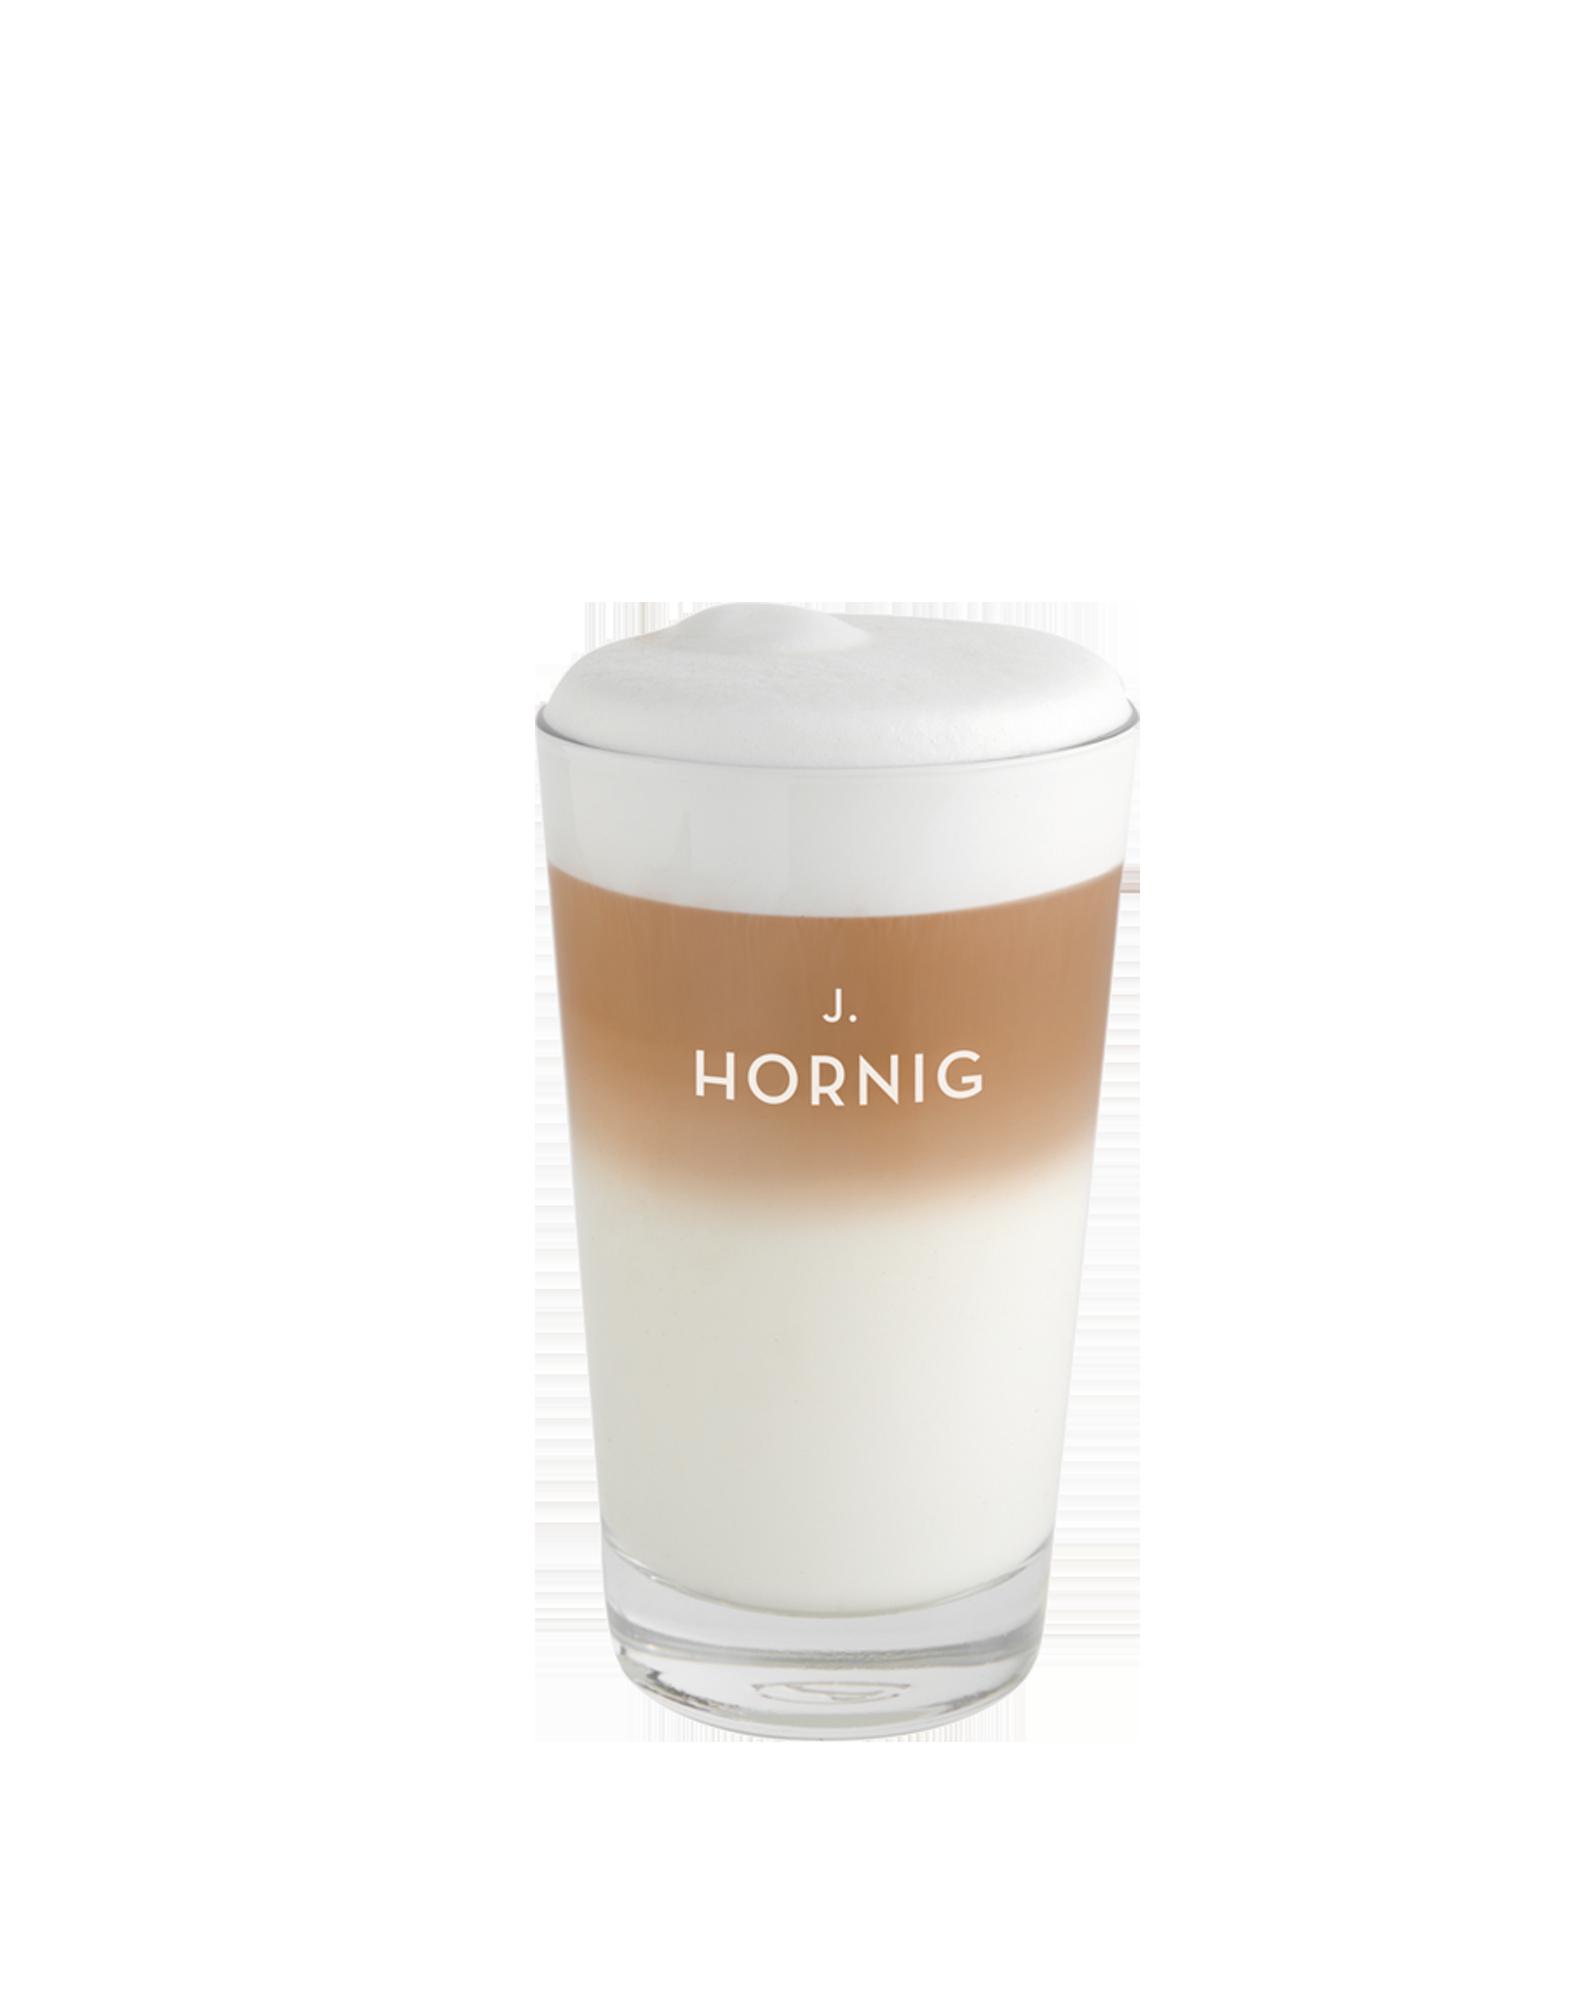 Caffè-Latte-Glas | Zubehör | J. Hornig